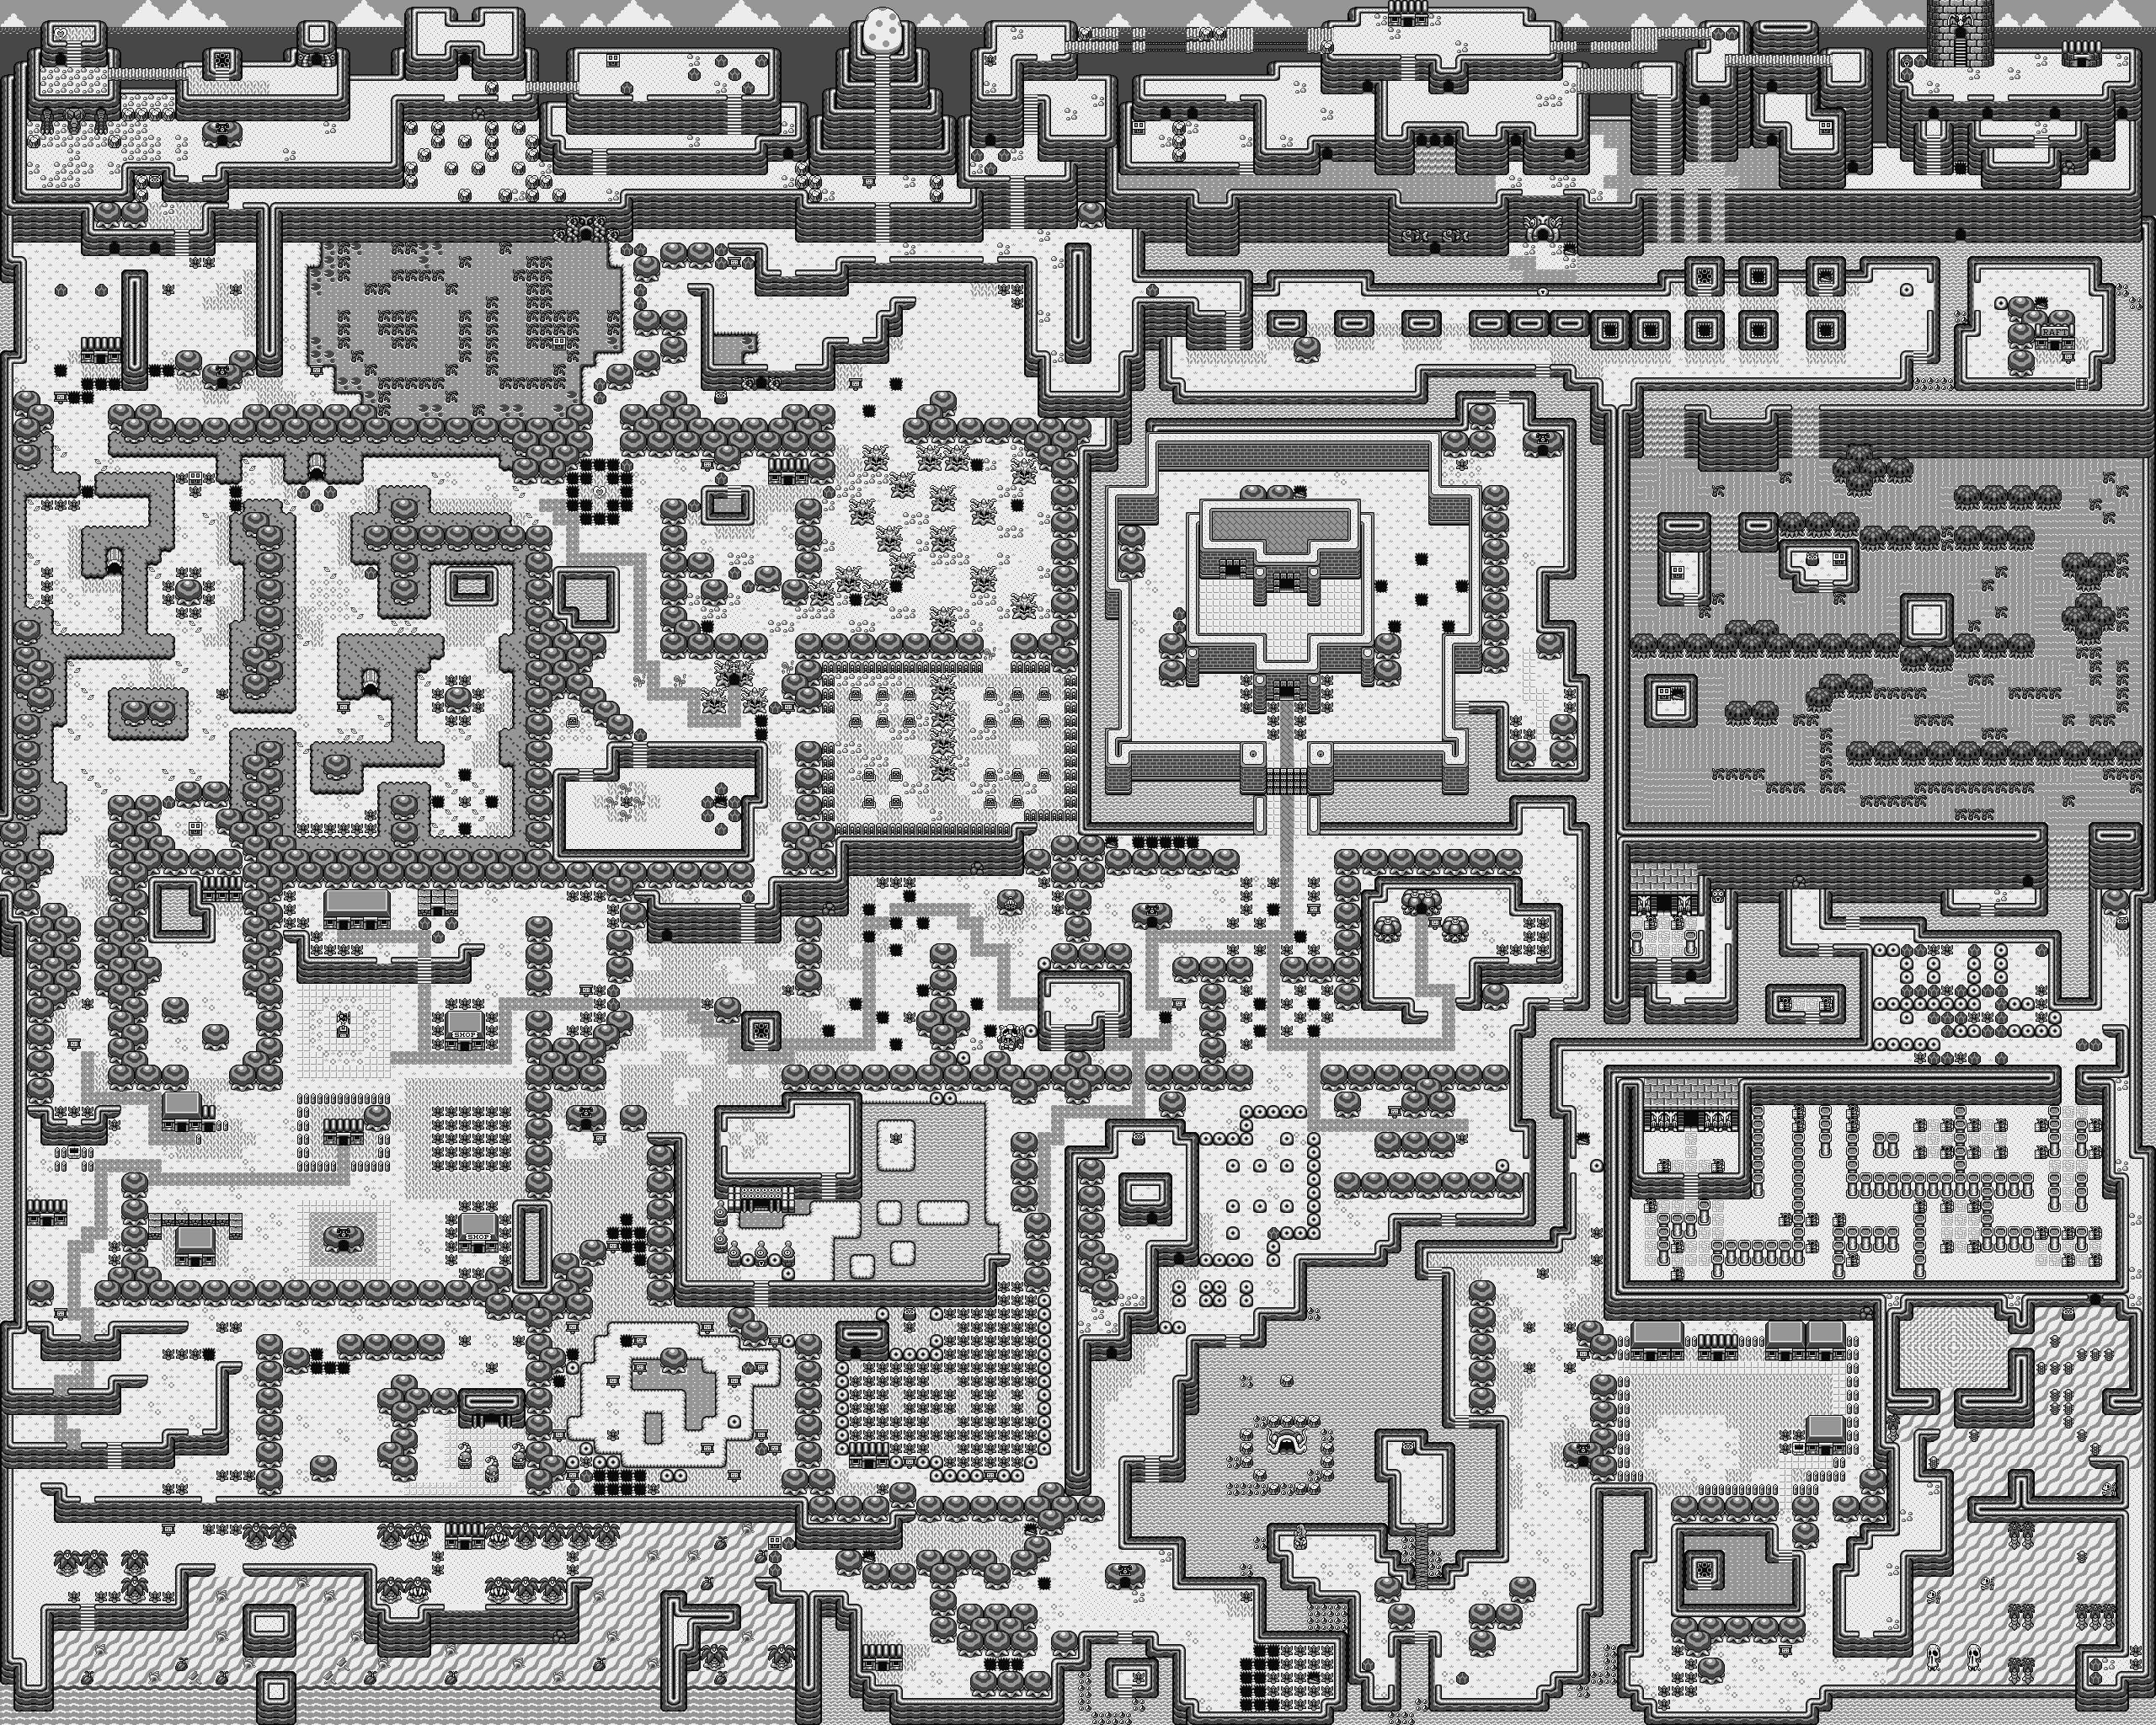 The Legend Of Zelda Links Awakening Wallpapers Video Game Hq The